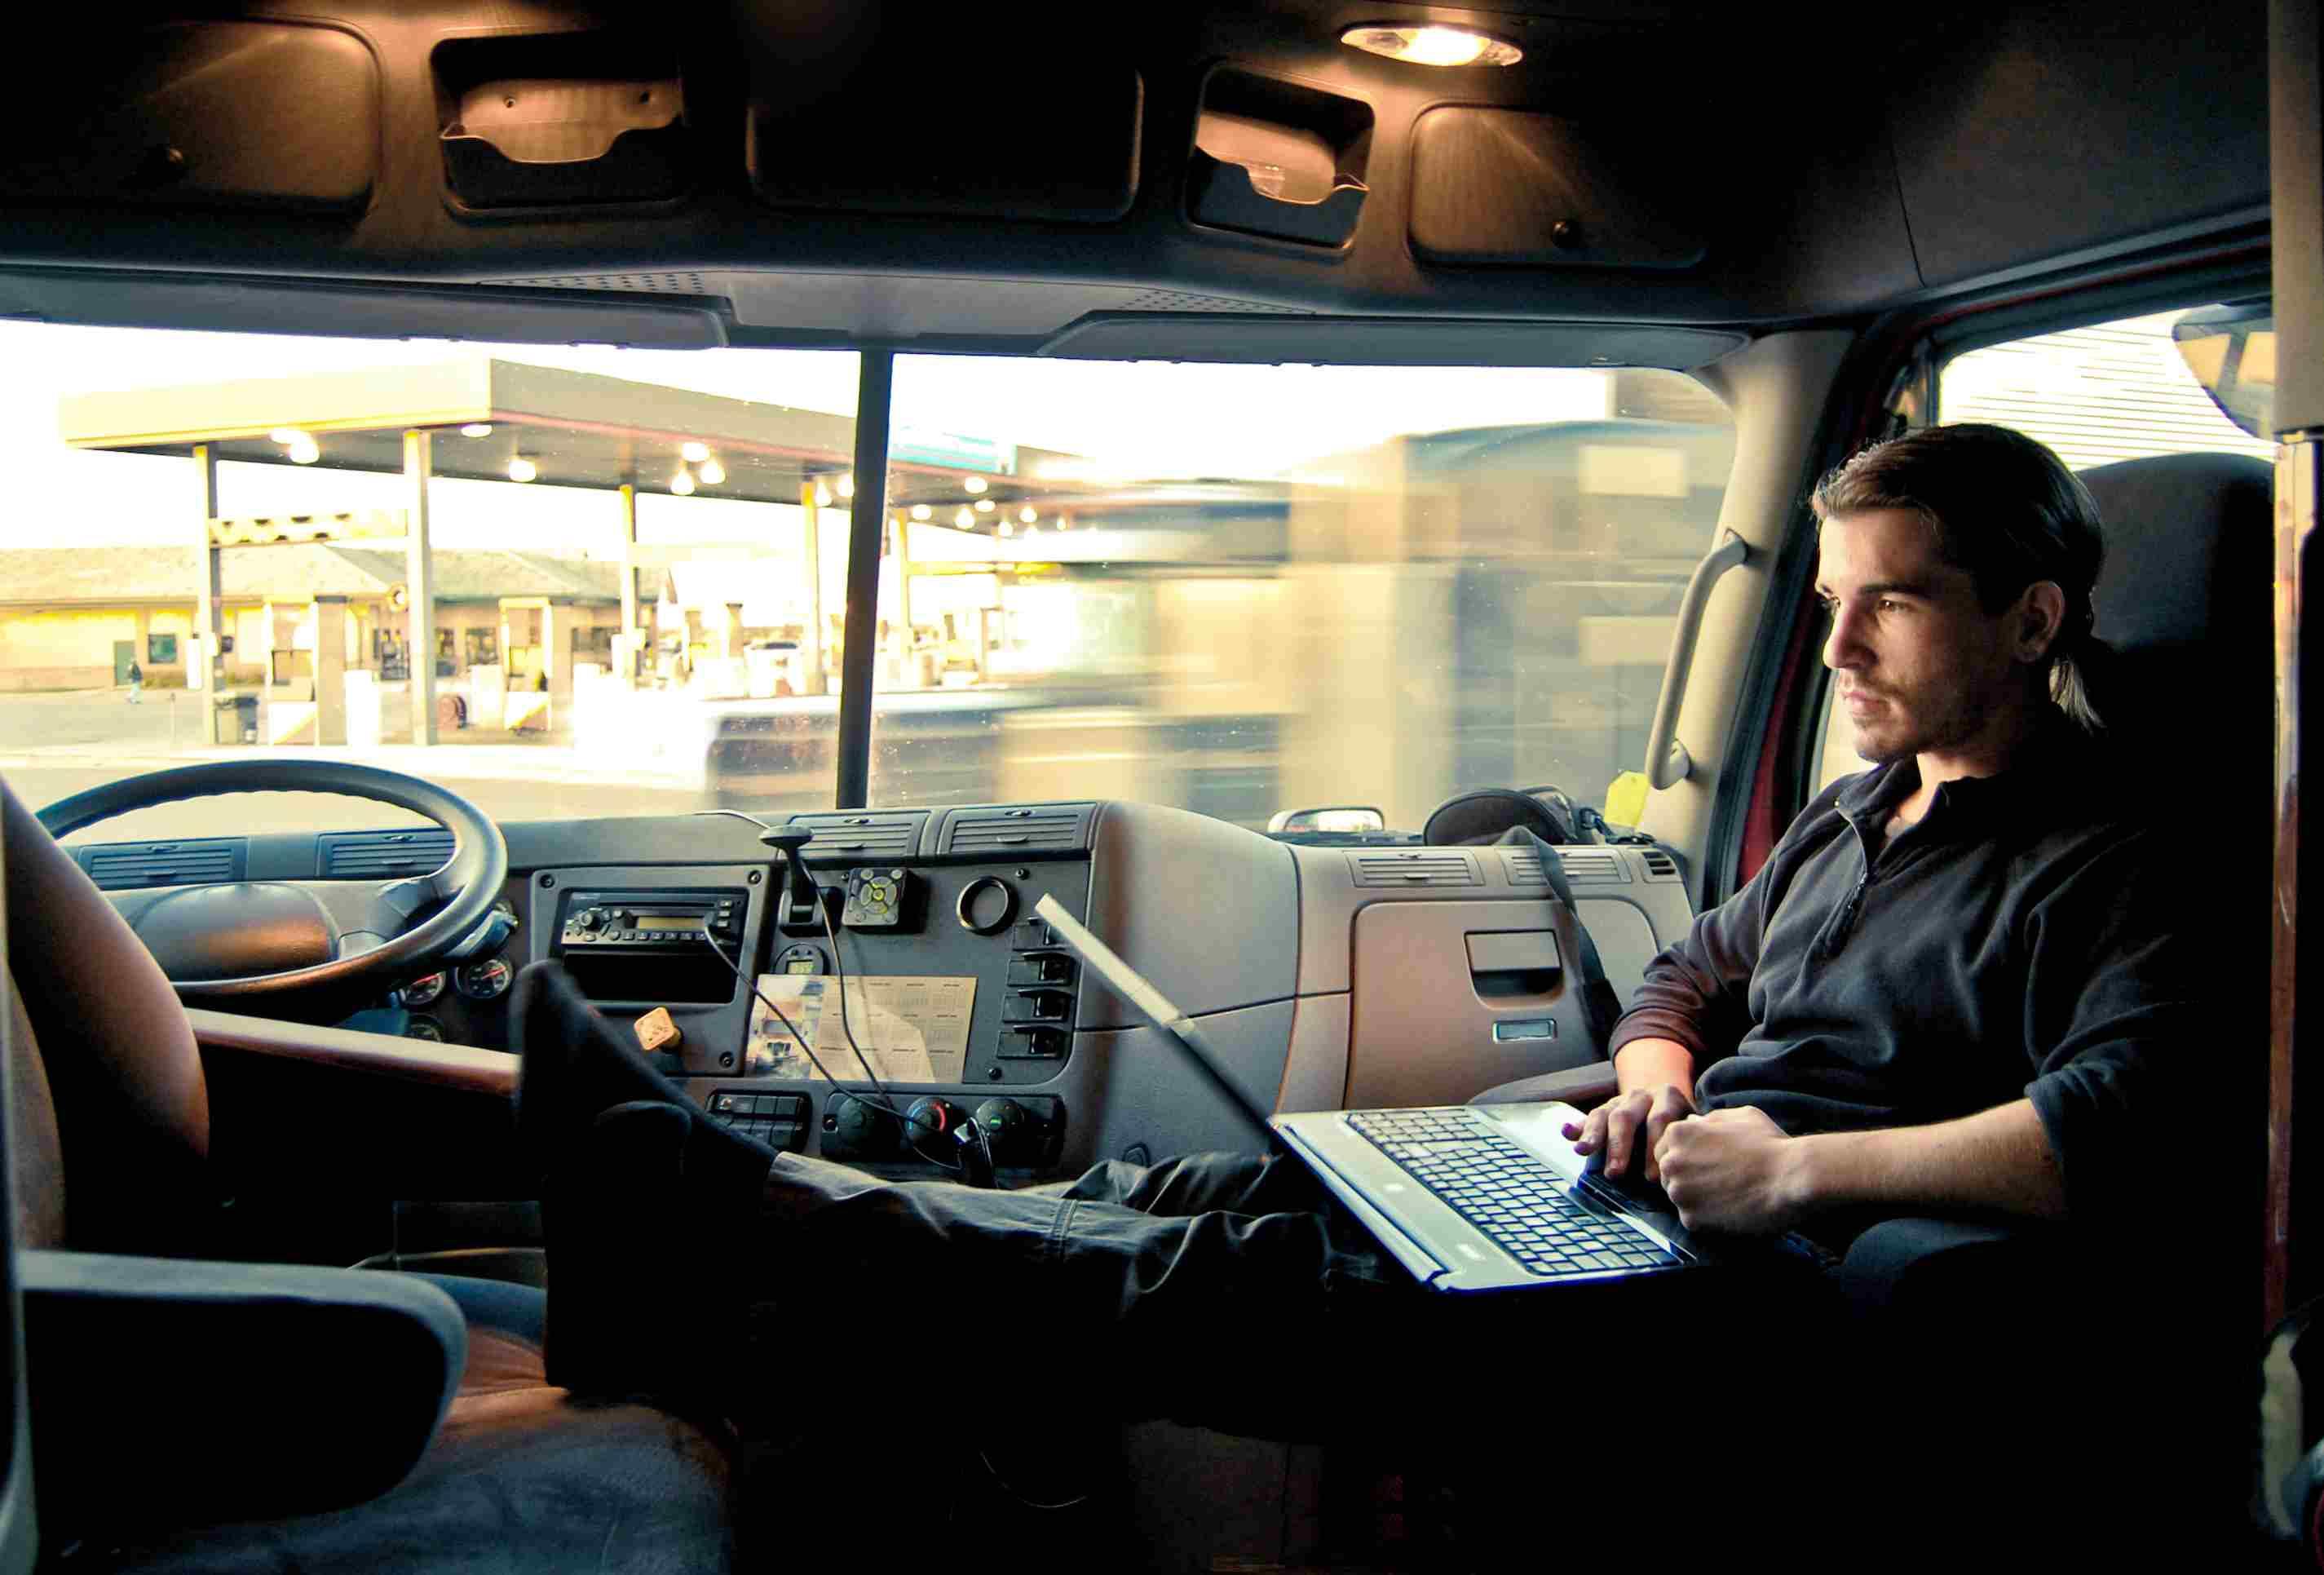 Truck driver enjoying Wi-Fi at truck stop